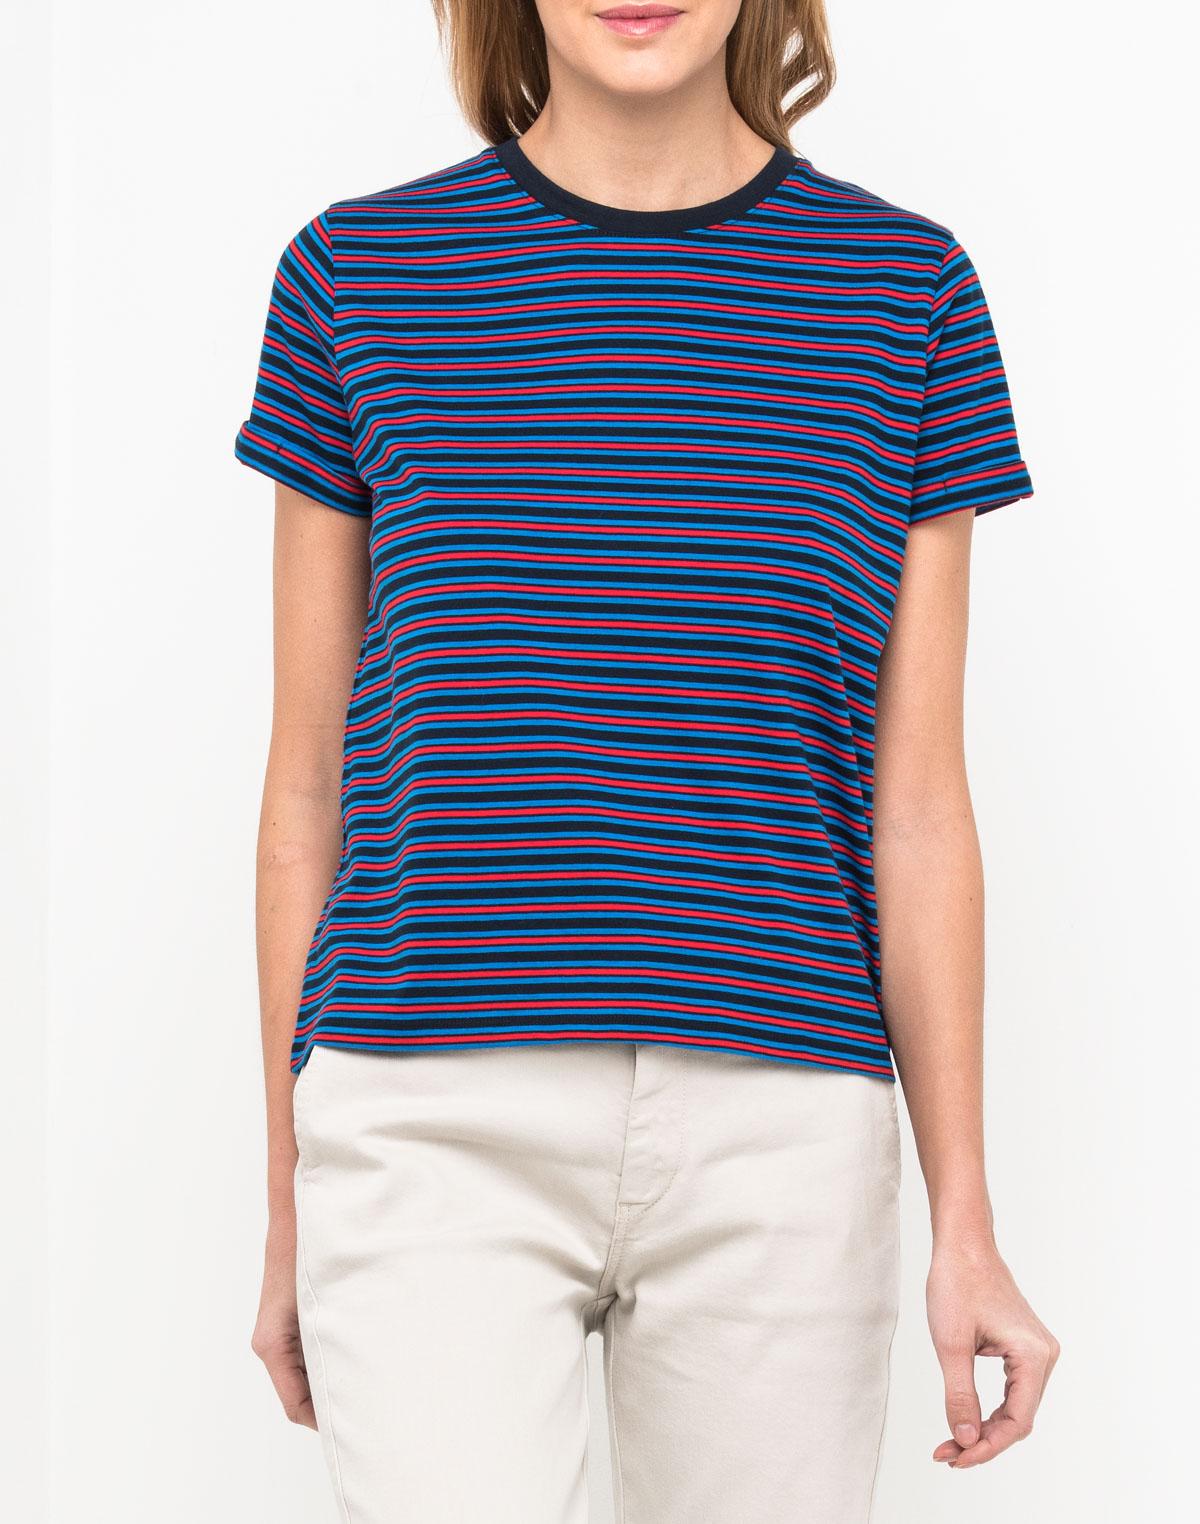 Футболка женская Lee, цвет: синий. L41FRUEE. Размер XS (40) футболка женская lee цвет белый черный l41erweh размер xs 40